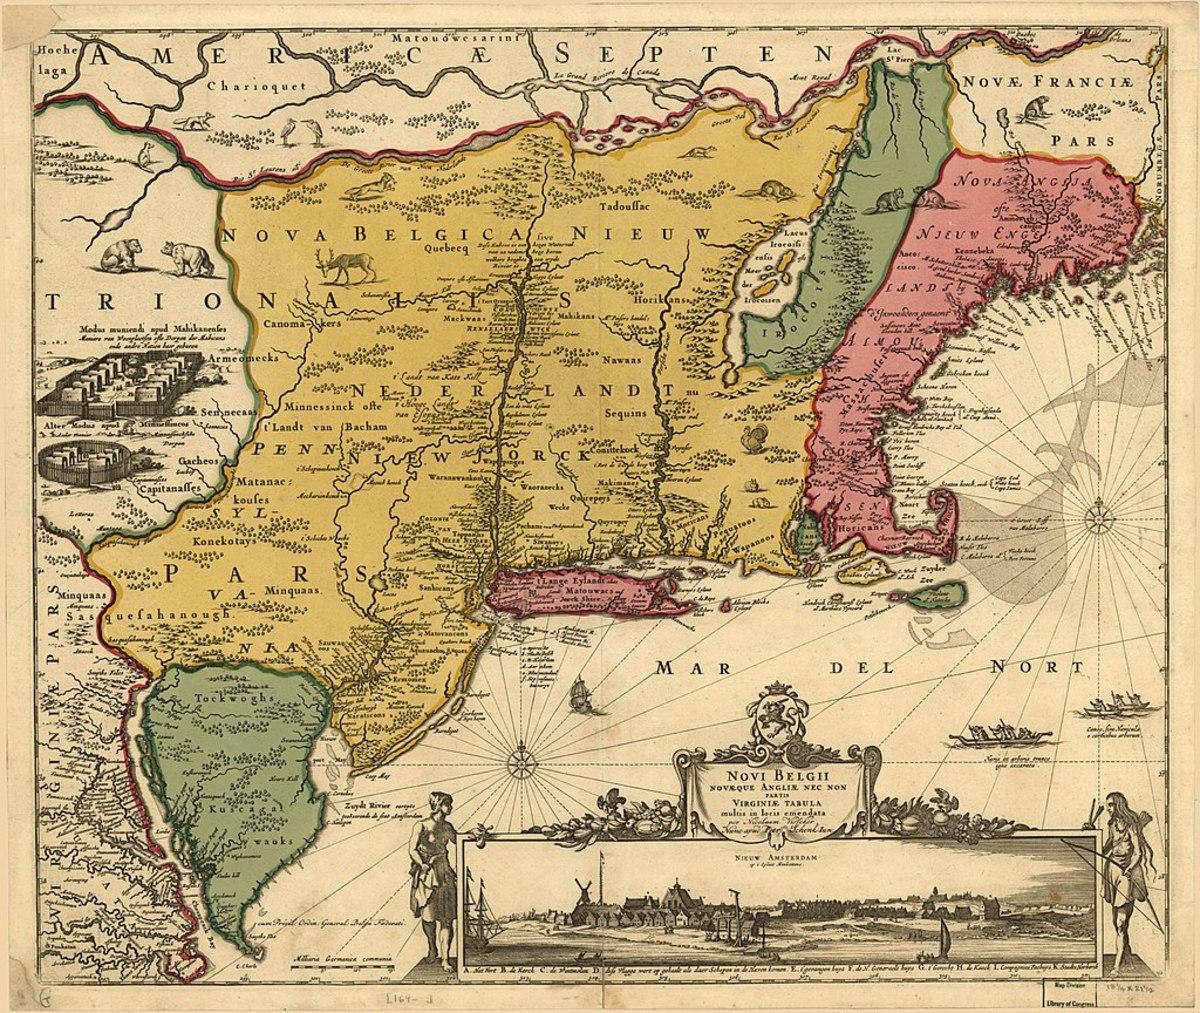 Dutch Colonization of the New world